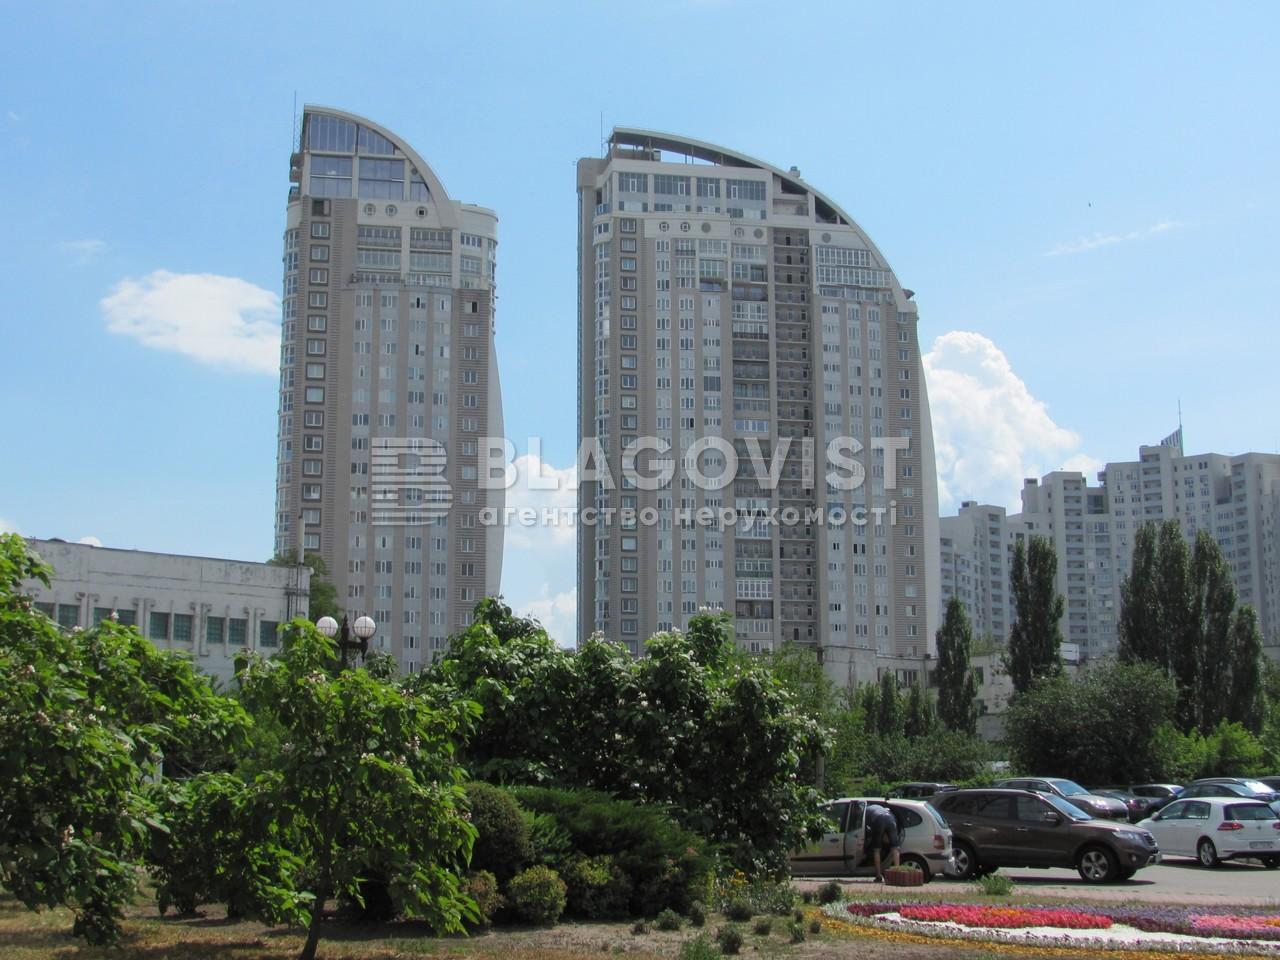 Квартира C-102428, Оболонская набережная, 1 корпус 1, Киев - Фото 1